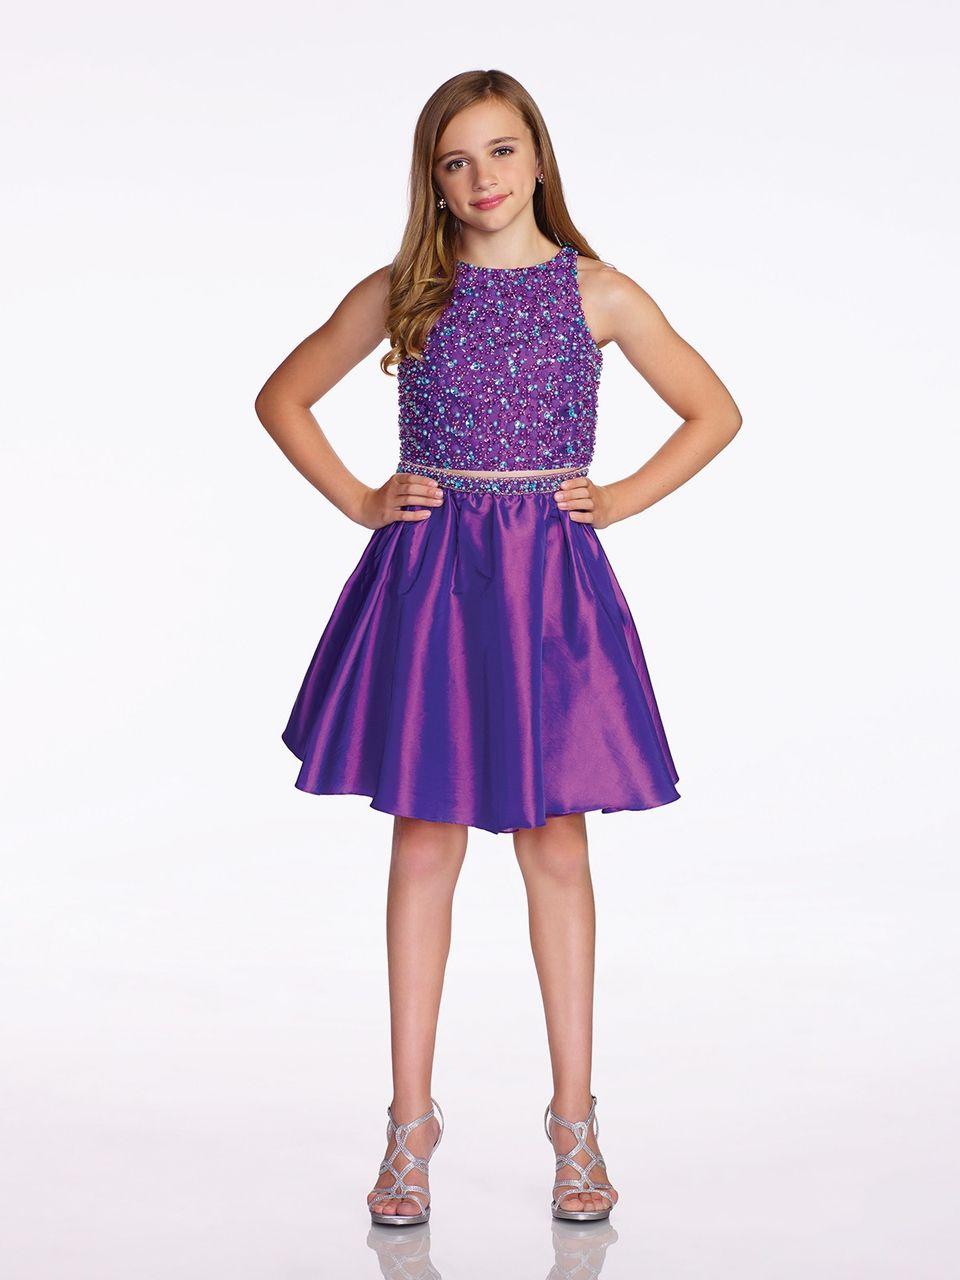 Lexie Girls Cocktail Dress TW11653